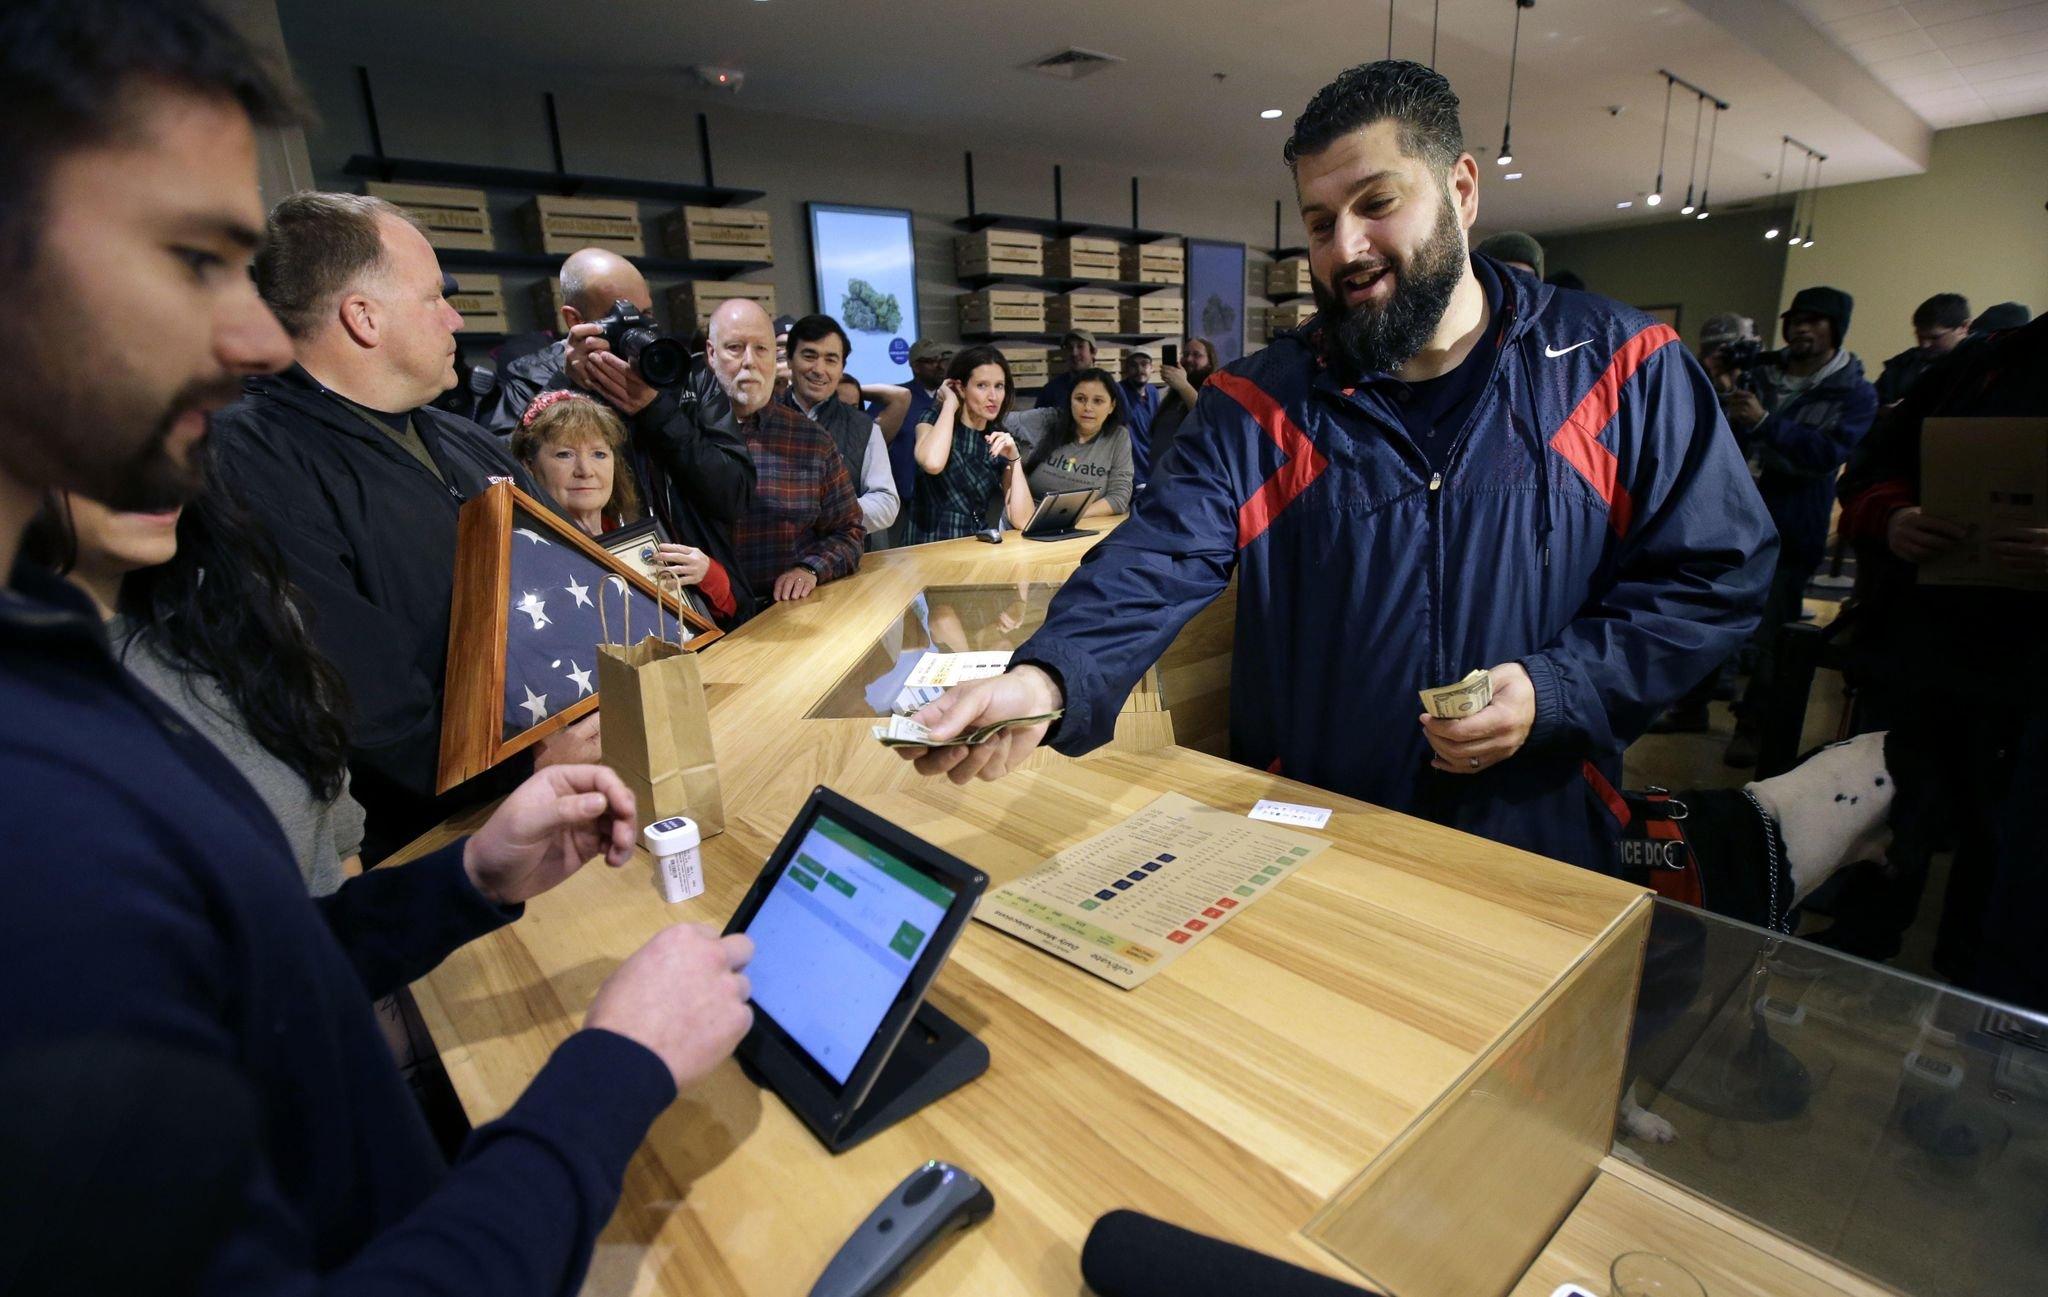 Marijuana regulators say customers spent $24 million at Mass. dispensaries during first two months